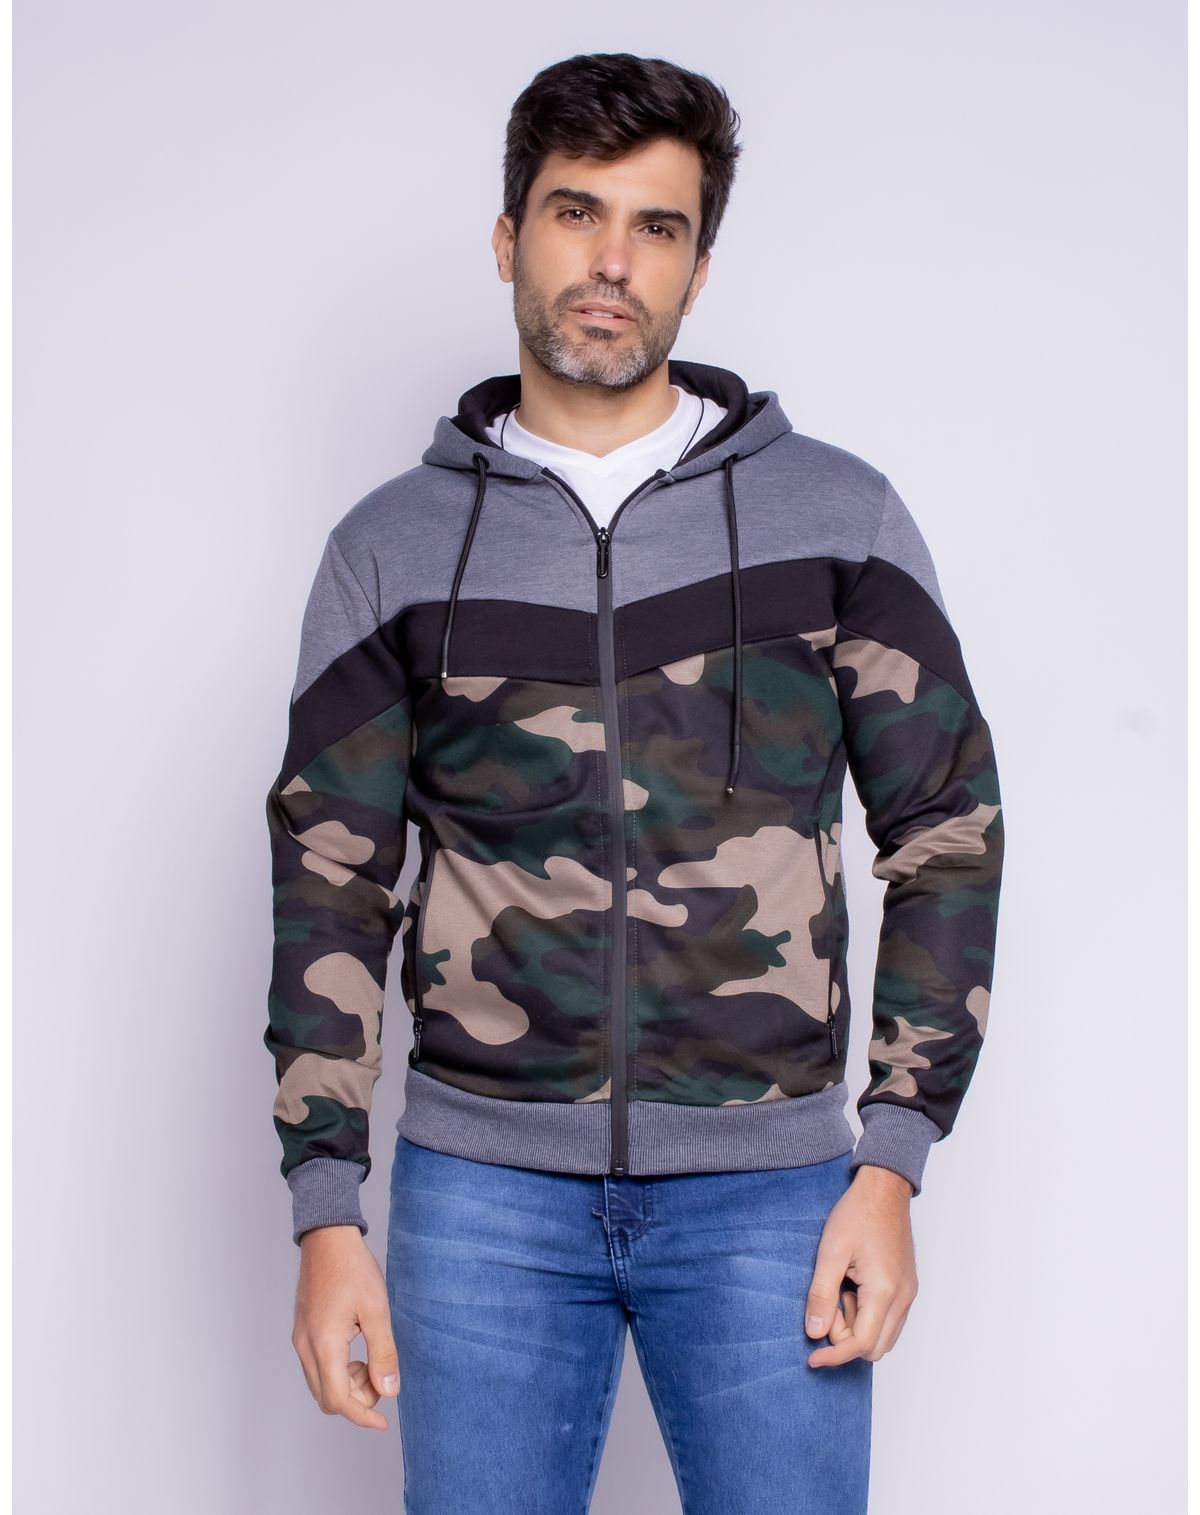 507122002-jaqueta-moletom-masculina-estampa-camuflada-militar-m-abf